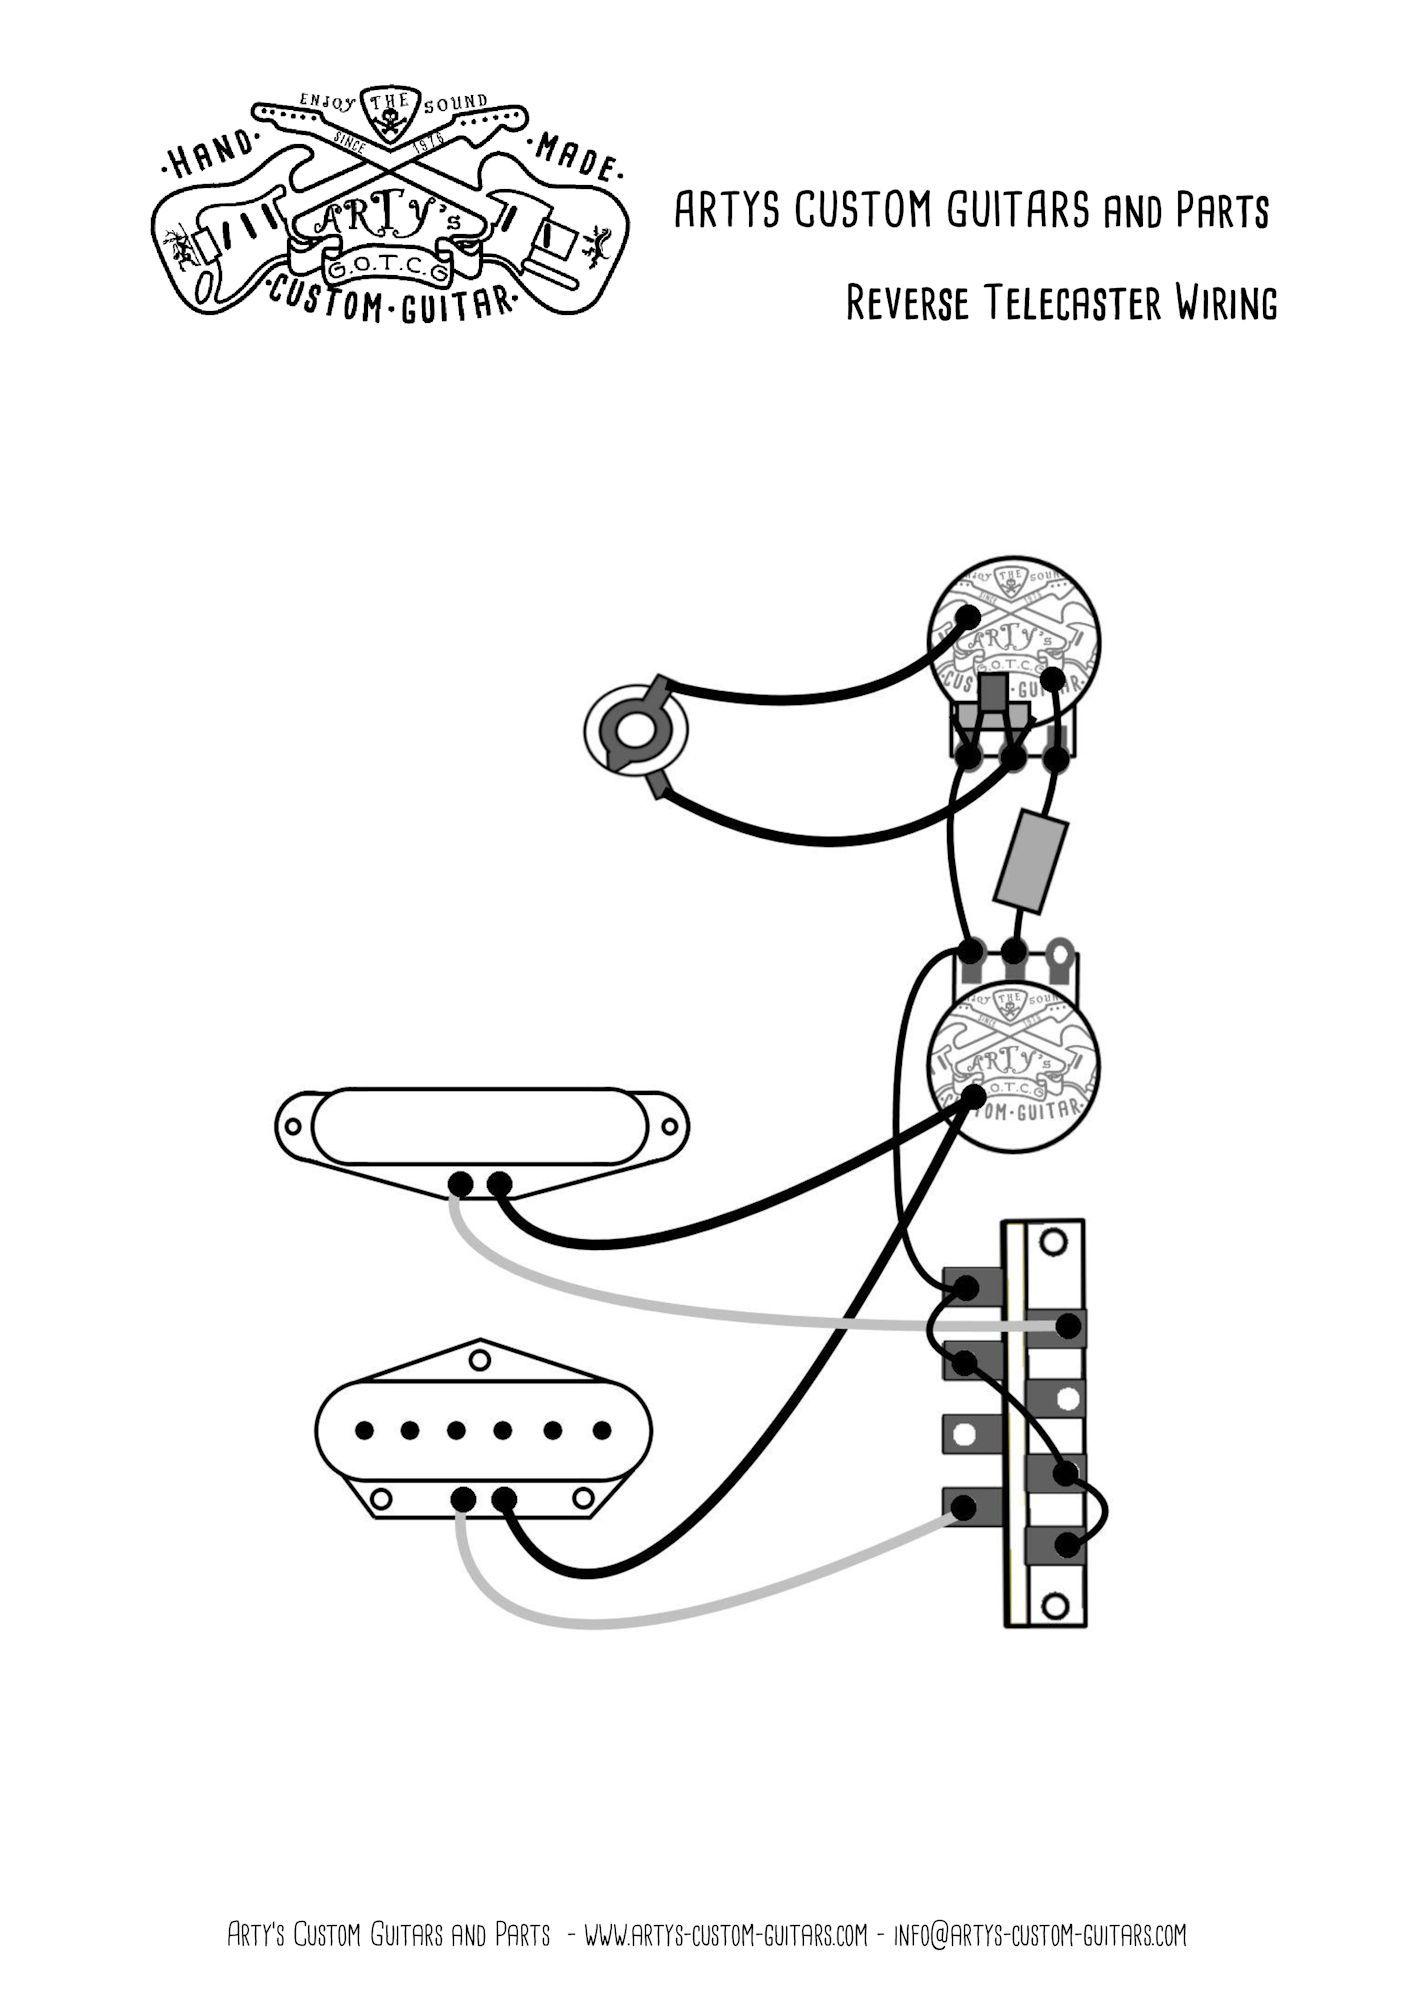 reverse telecaster wiring diagram